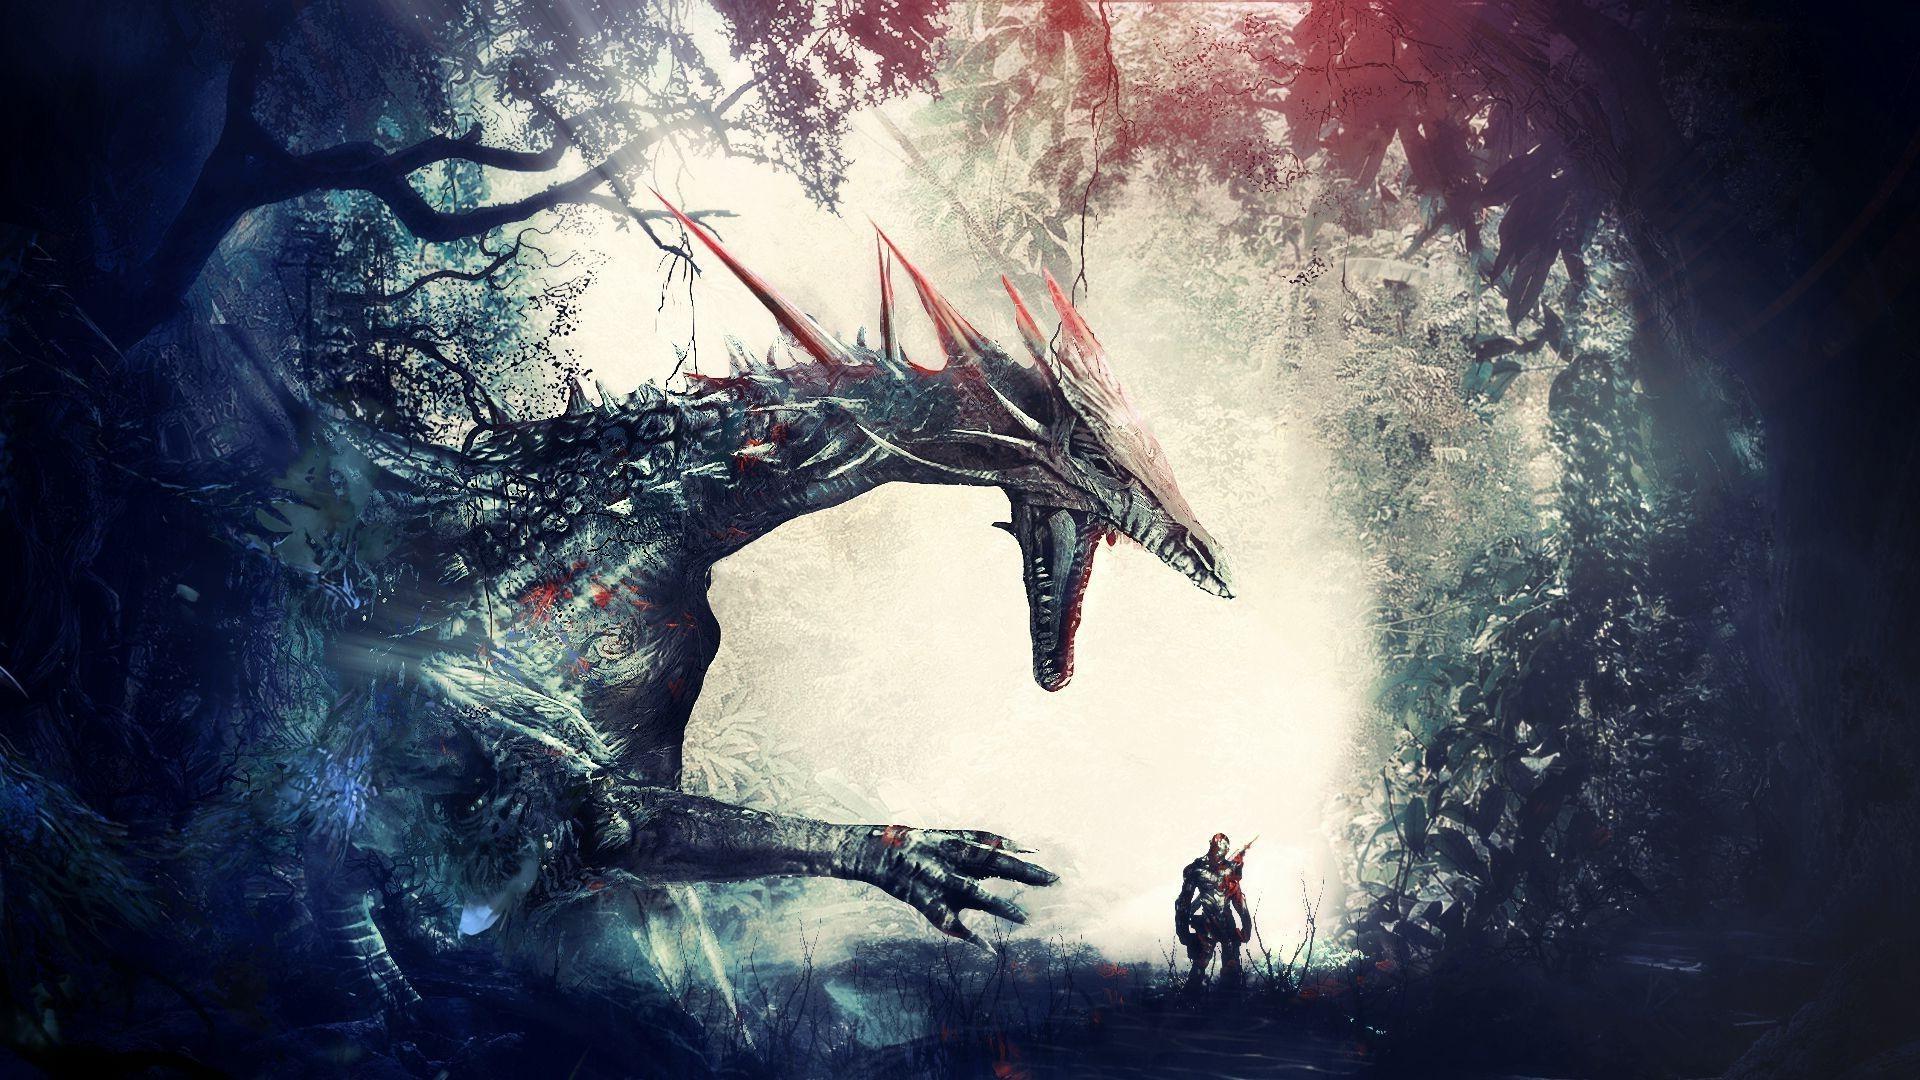 artwork, Fantasy Art, Warrior, Dragon, Forest, Knights, Dragon Age: Origins  Wallpapers HD / Desktop and Mobile Backgrounds